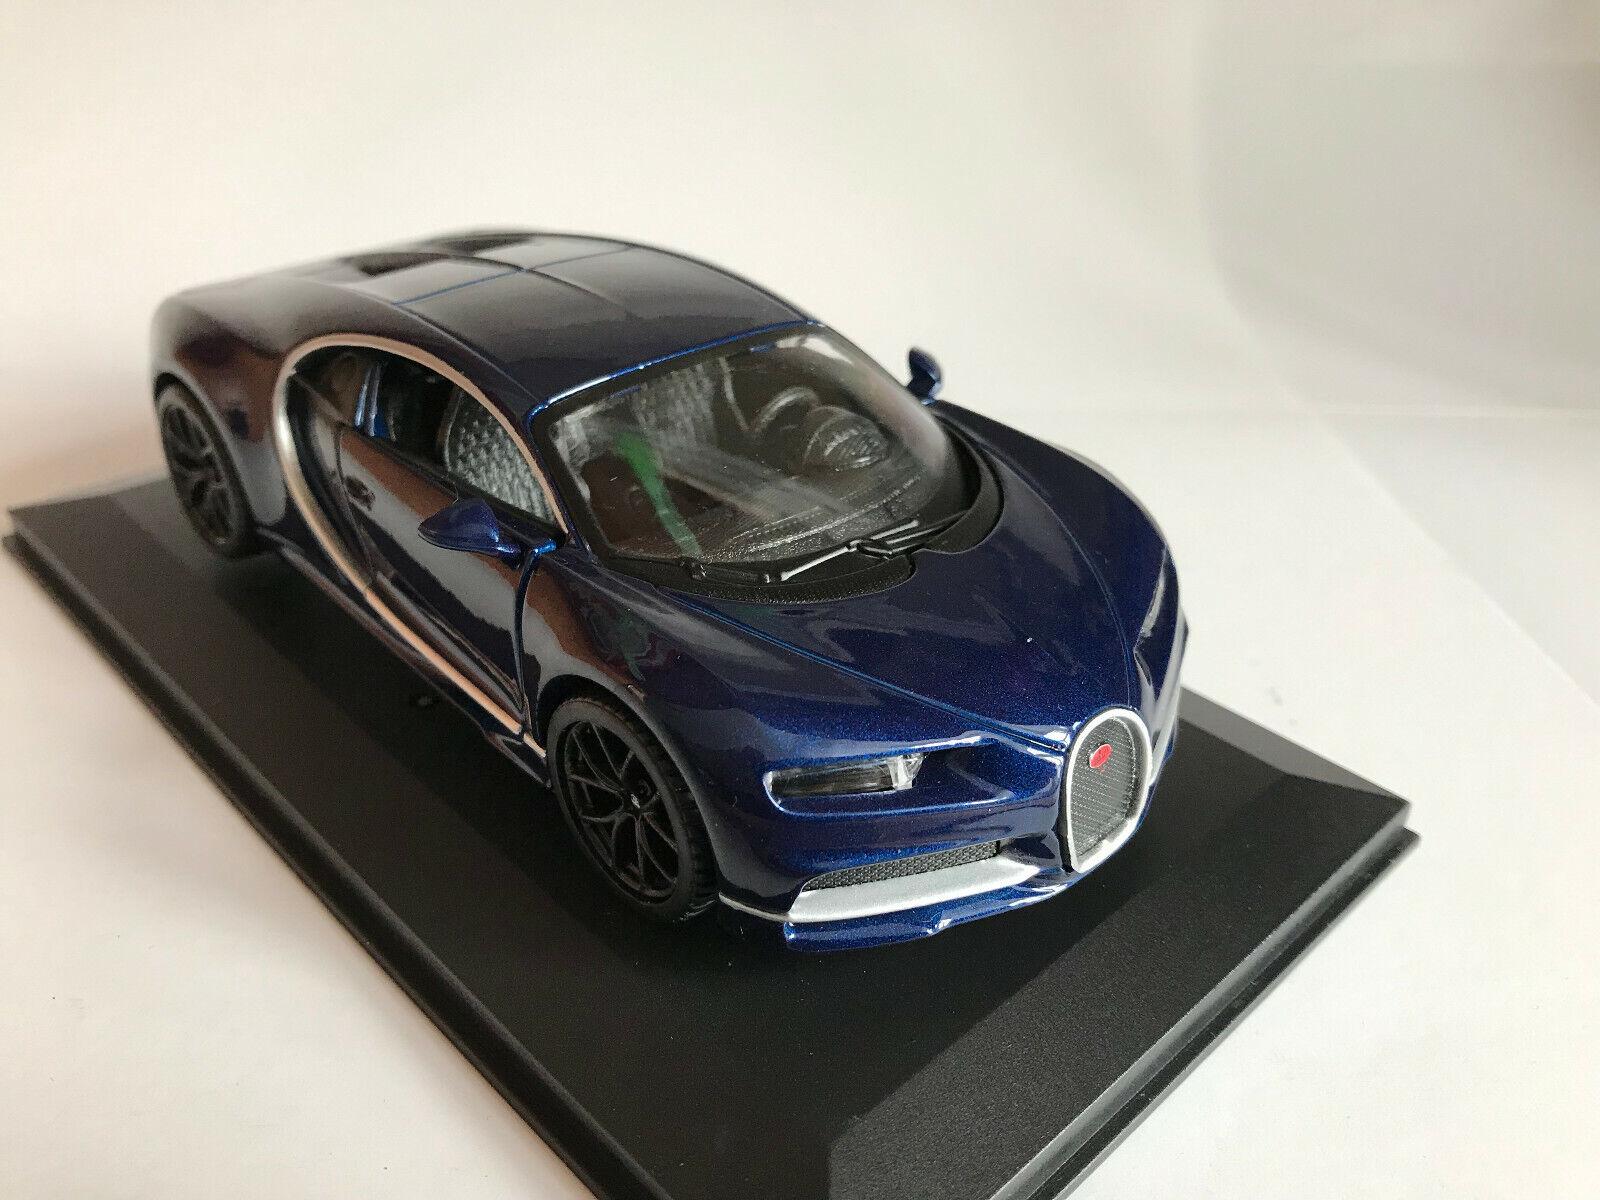 42025 Bburago 1:32 Bugatti Chiron DARK BLUE BLEU FONCé